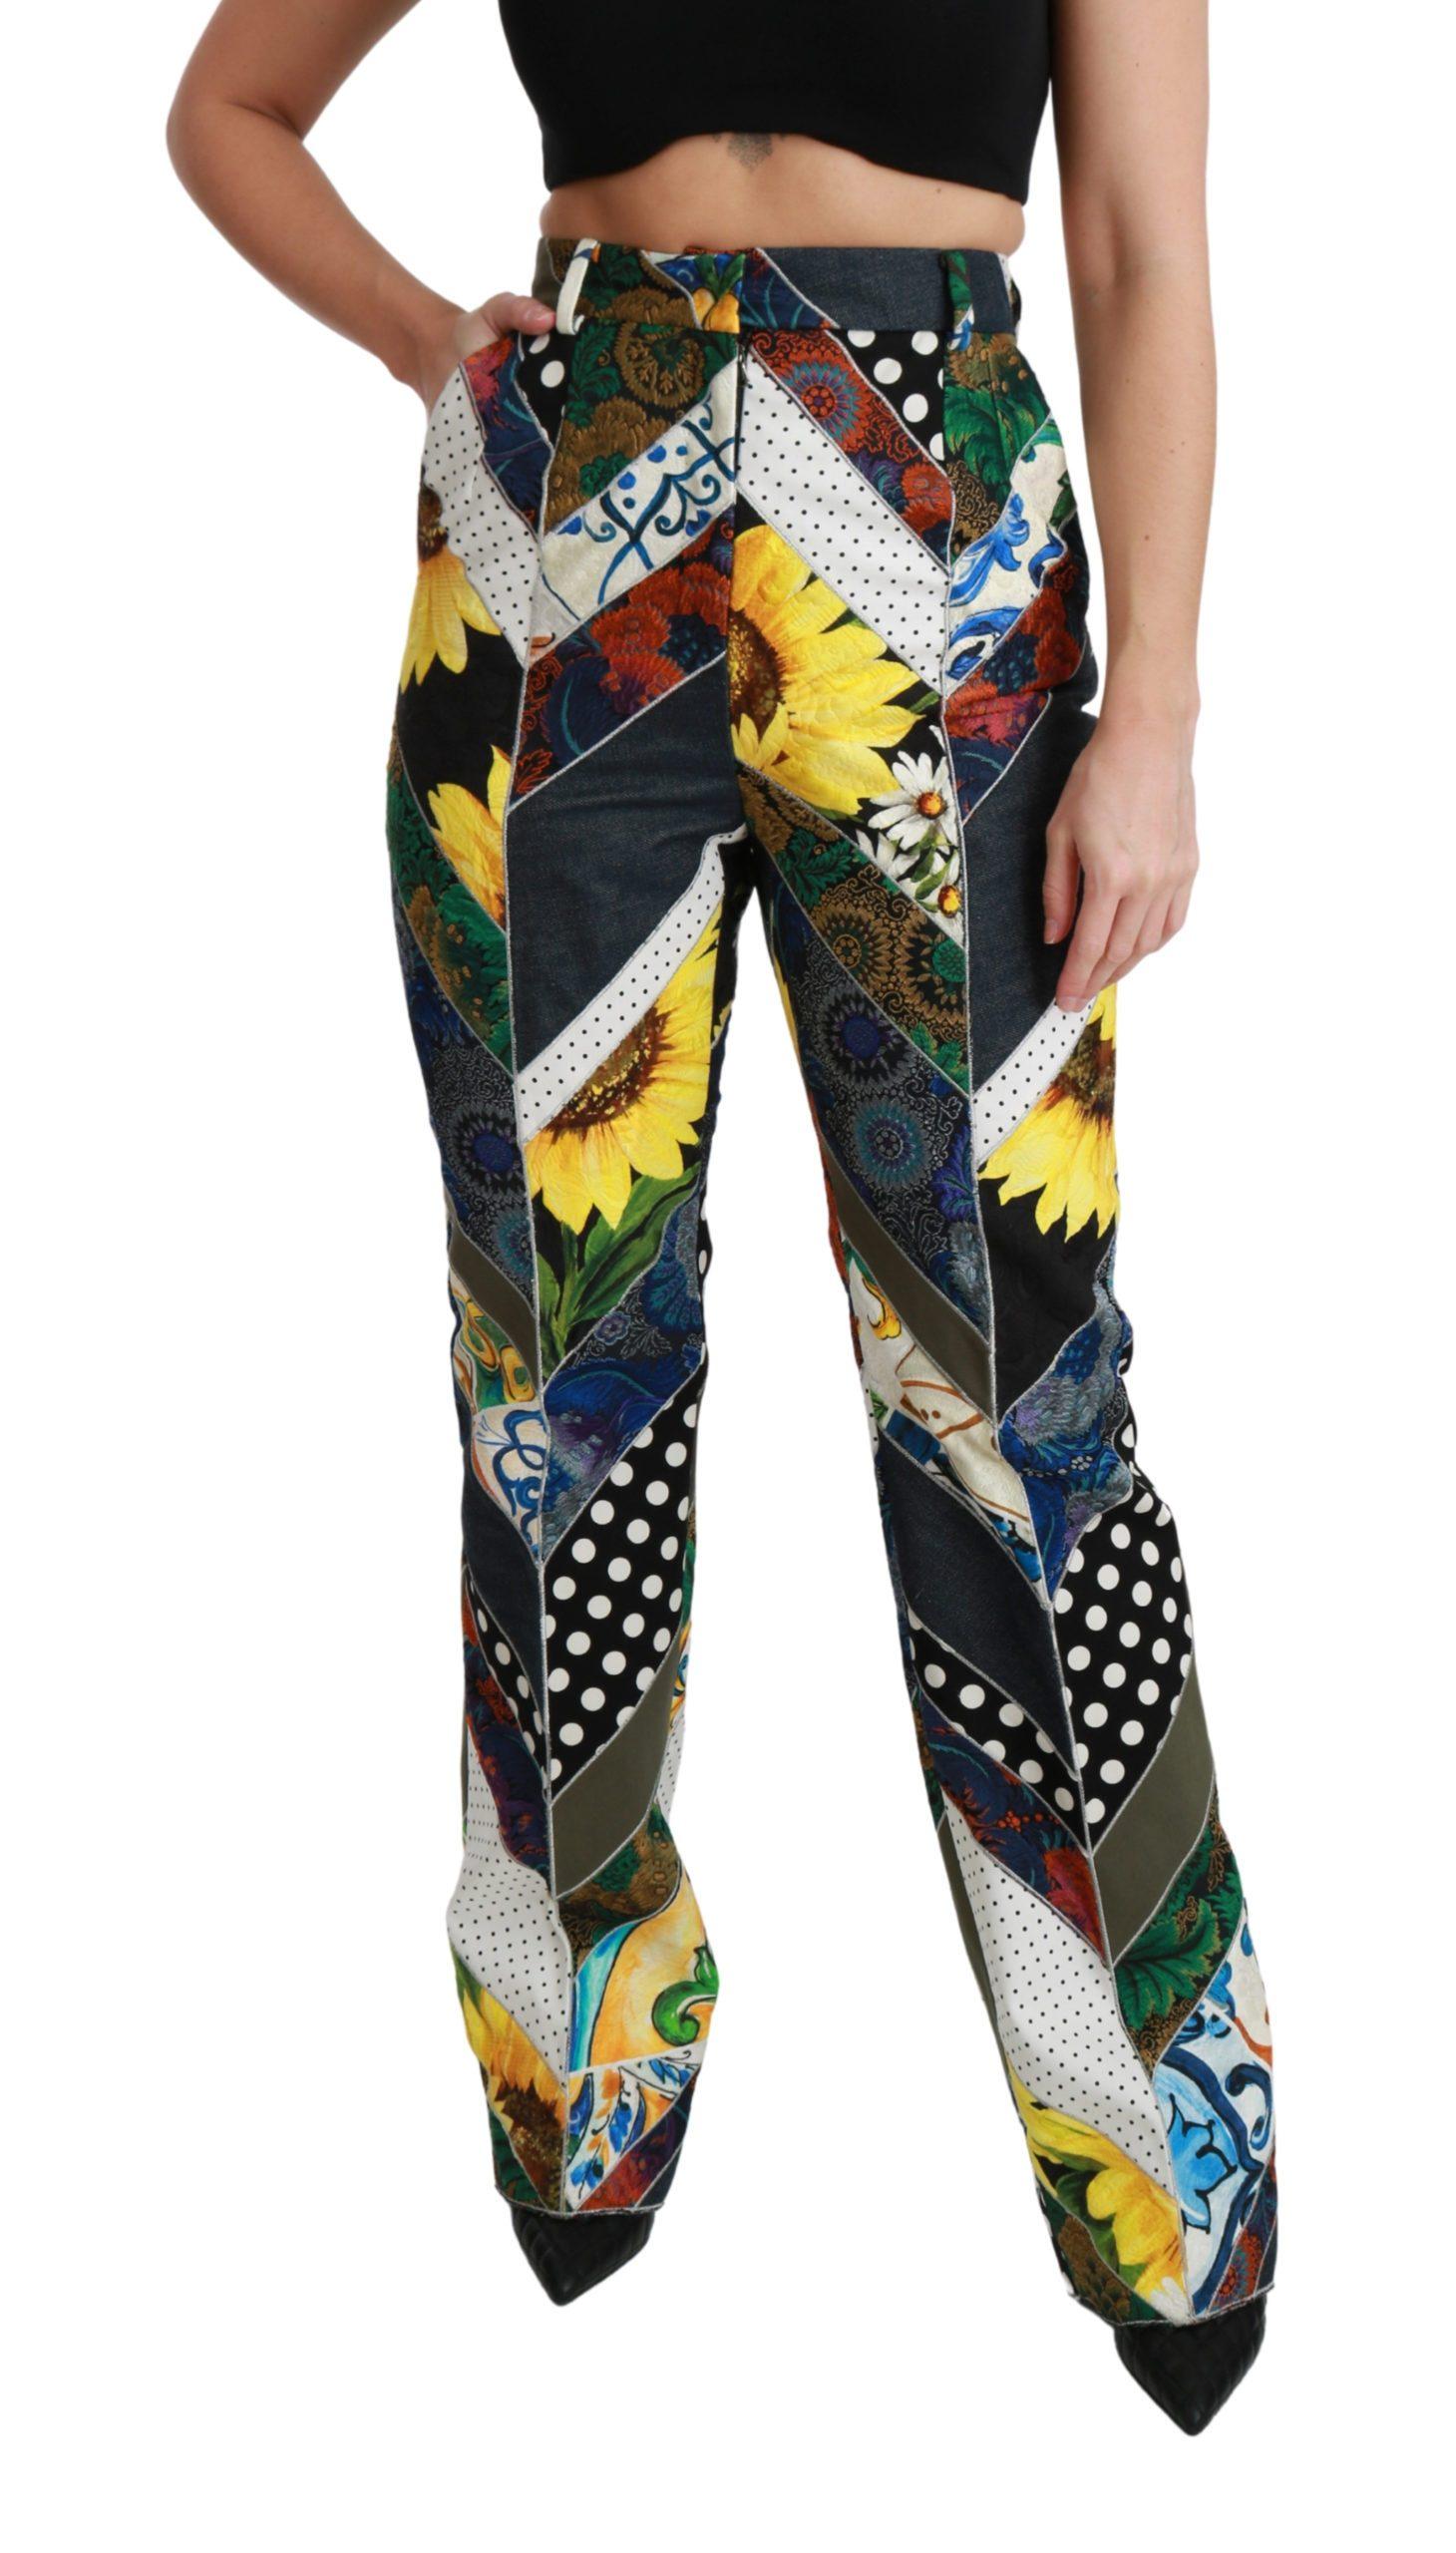 Dolce & Gabbana Women's Print High Waist Straight Trouser Multicolor PAN70936 - IT40 S